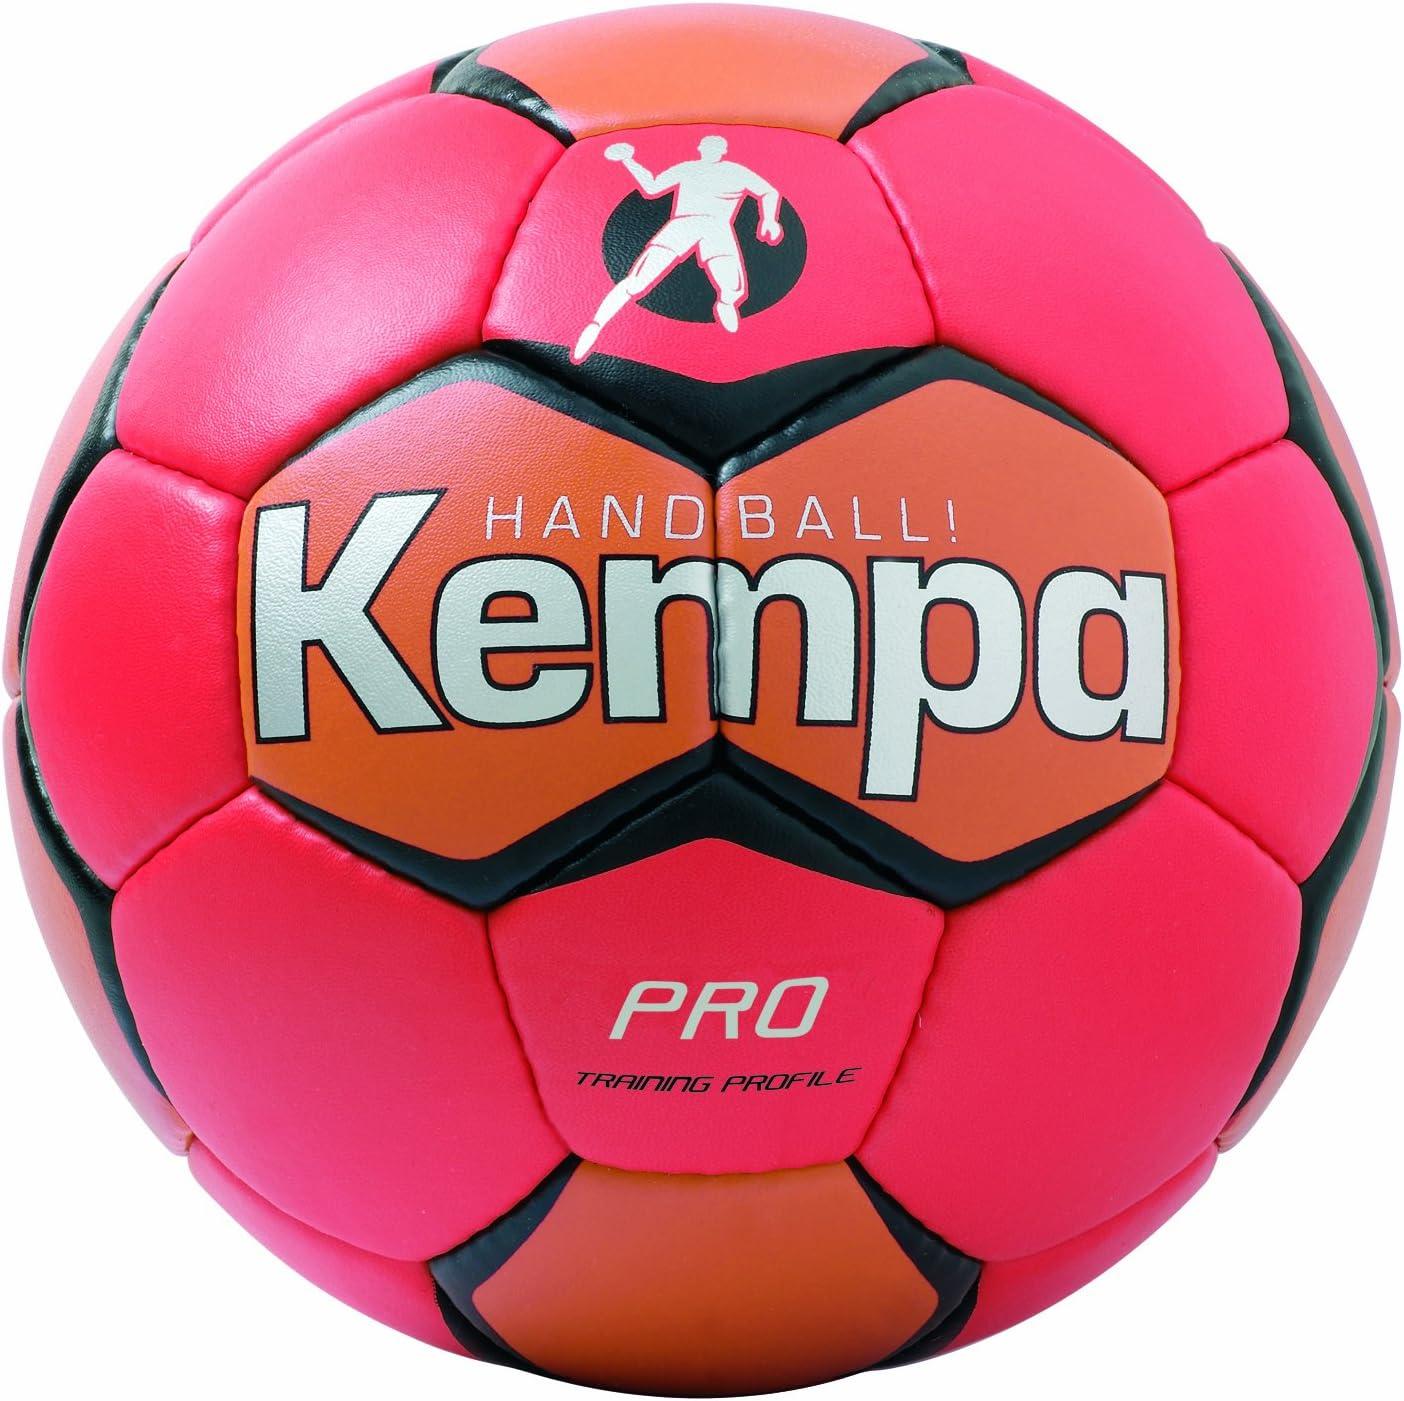 uhlsport Kempa Handball Pro - Pelota para Entrenamiento de ...